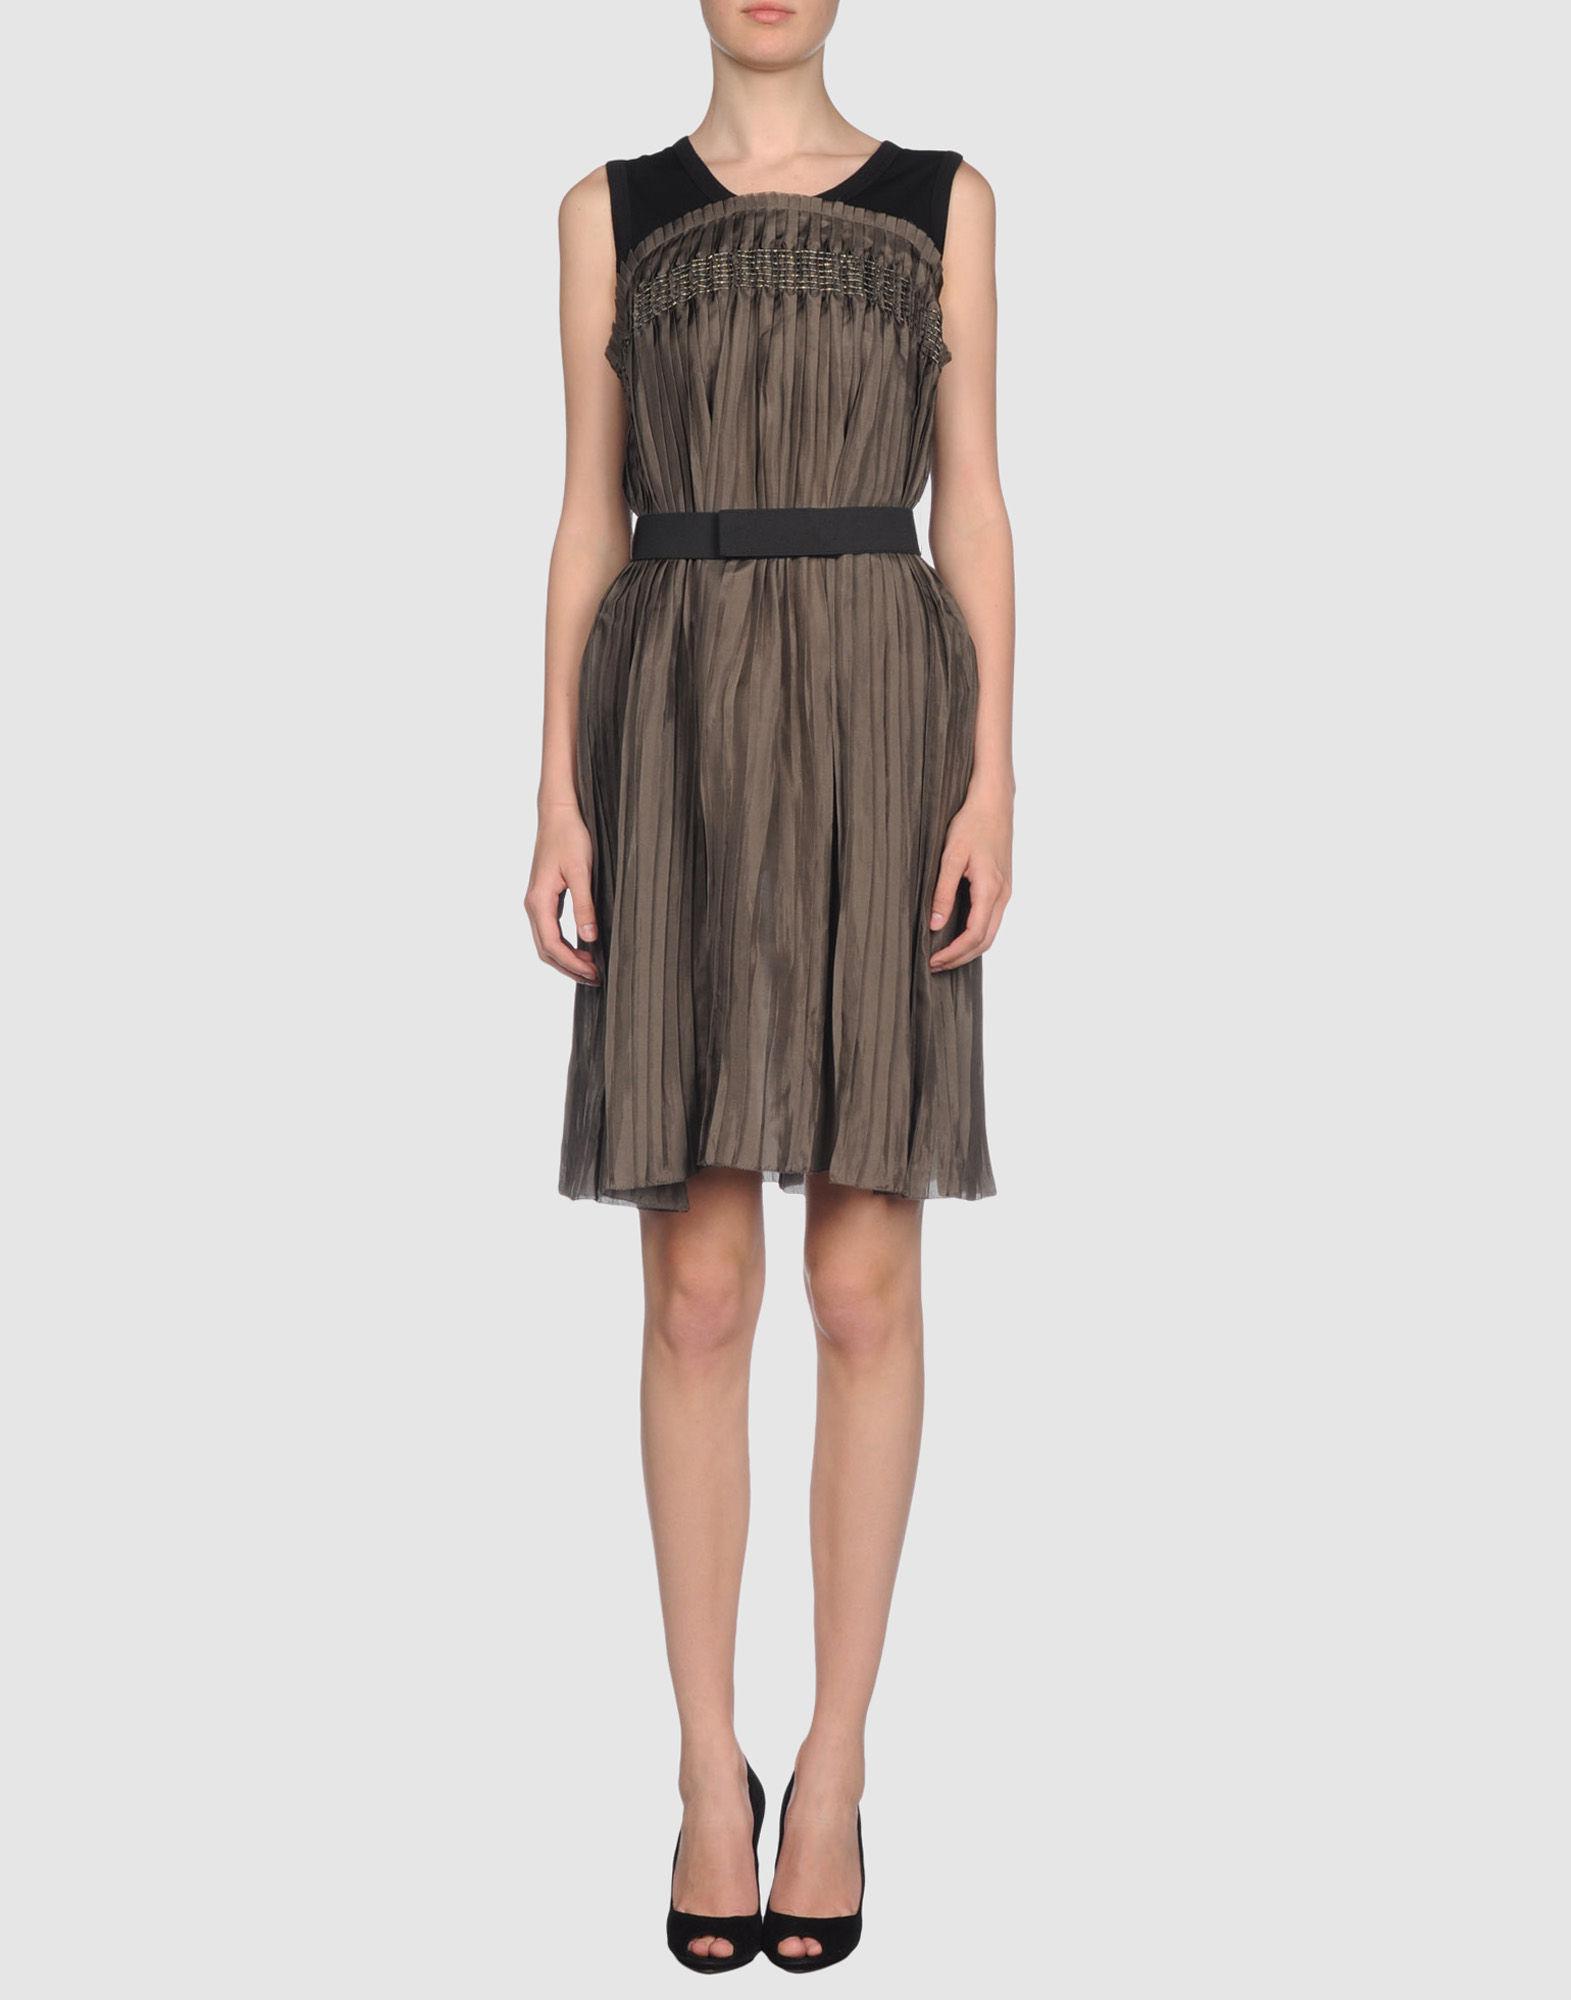 34212517AN 14 f - Evening Φορεματα Vera Wang 2011 2012 Κωδ.03